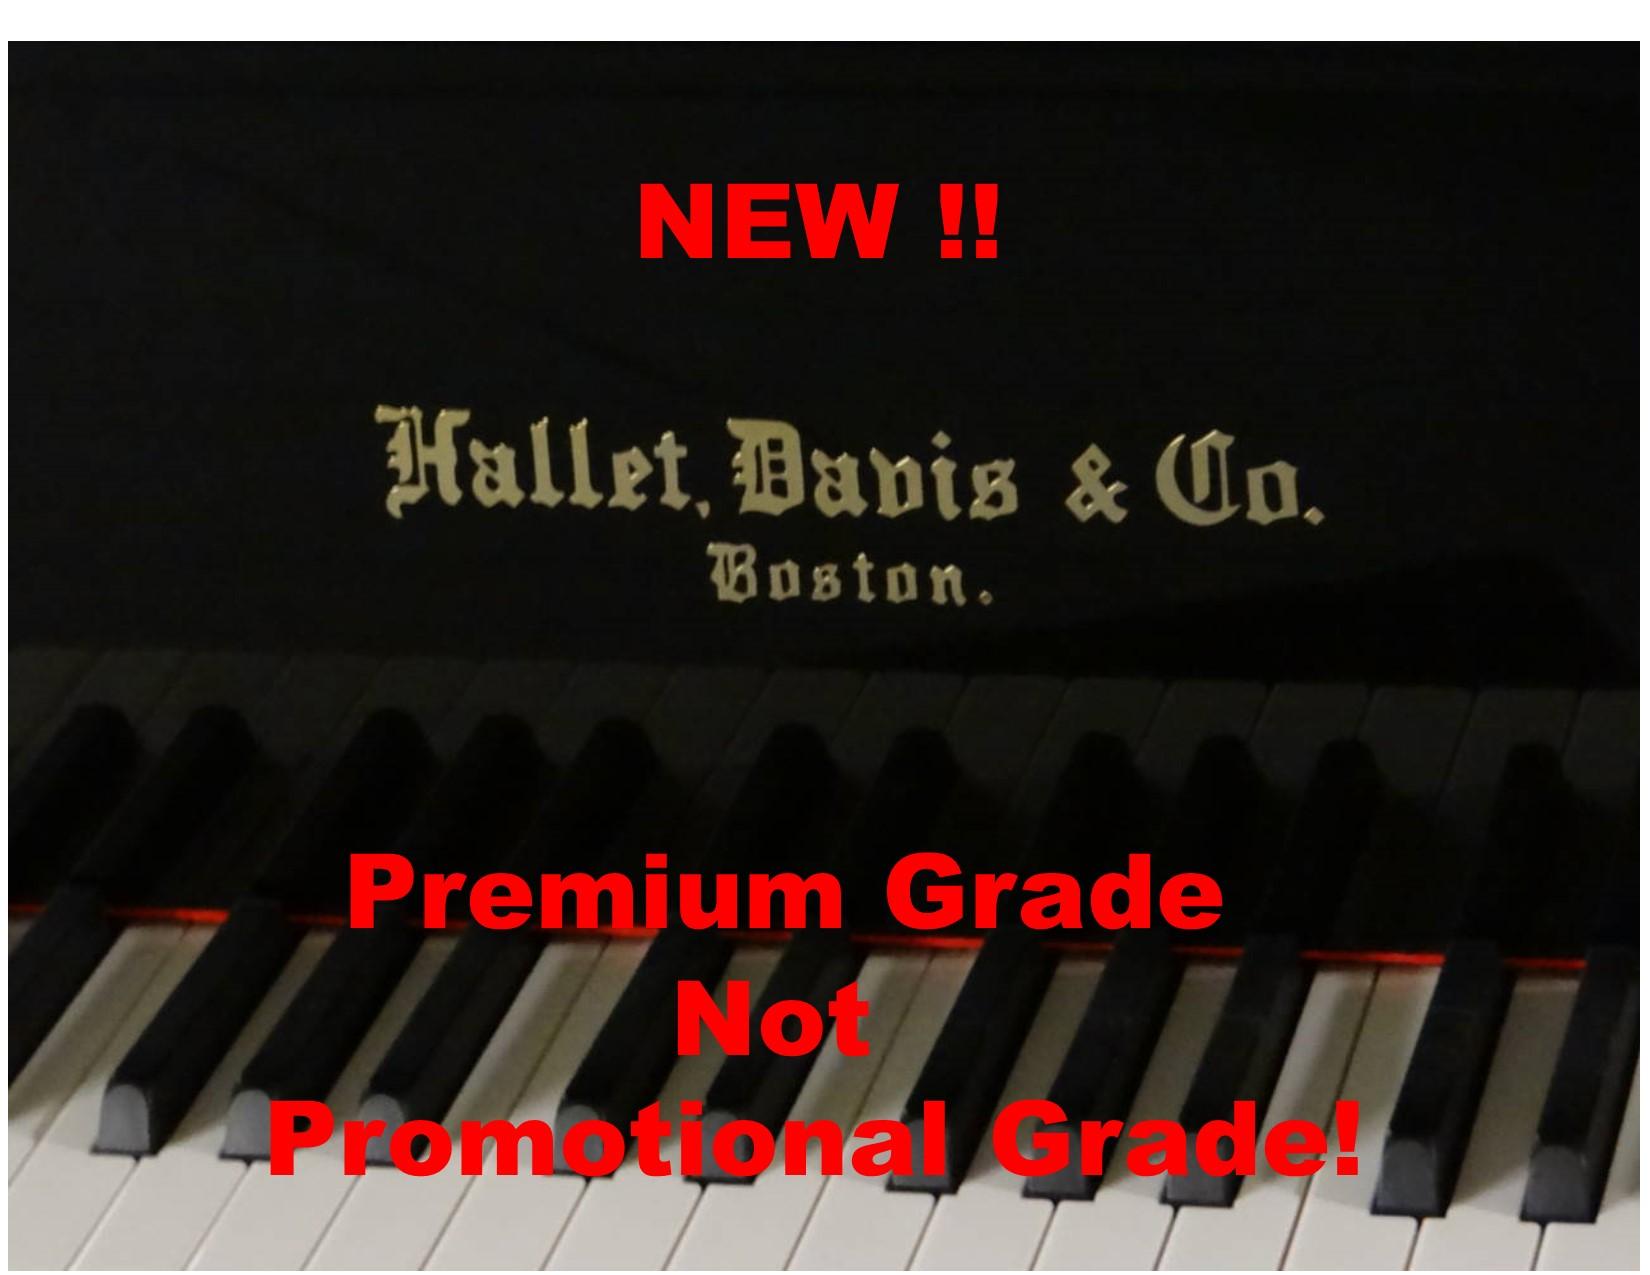 "13998-<br><font color=black><b>NEW HALLET DAVIS</b></font> 5'3″ Premium Grade ""German Wide Tail Design""<br><font color=blue><b>Click Picture for ""Live Video"" and Specifications</b></font> <br><font color=""red""><b>Guaranteed Lowest Price !</b></font>"